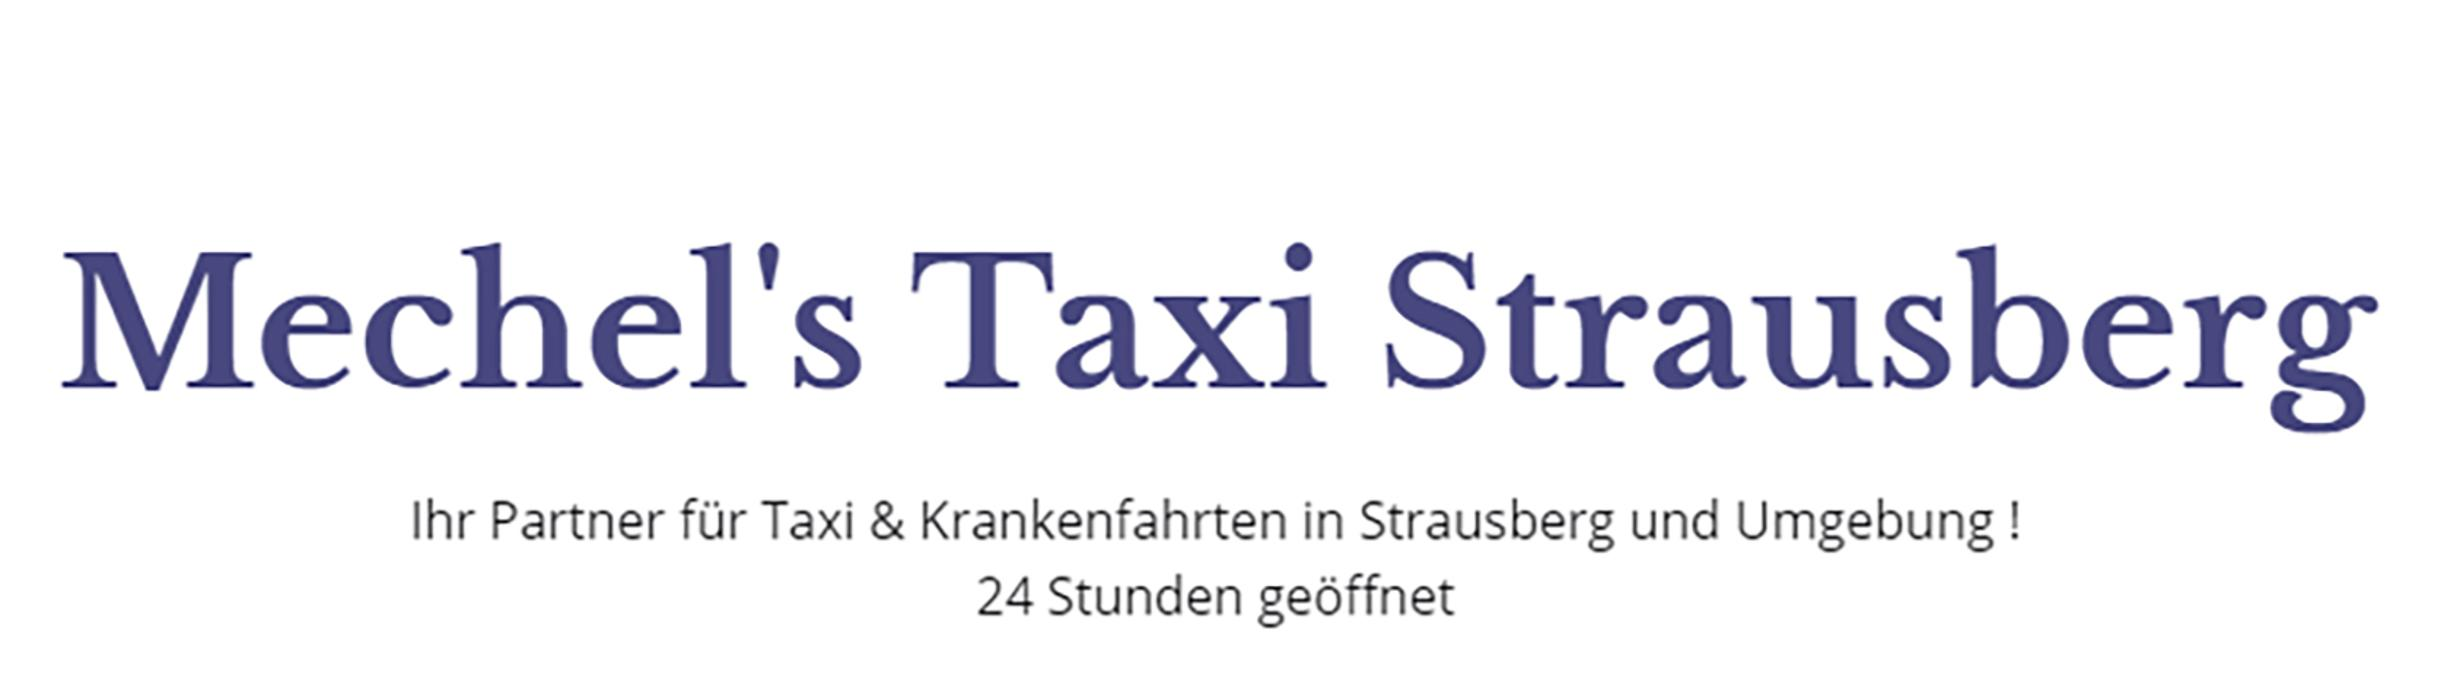 Bild zu Mechel's Taxi Strausberg - Taxiunternehmen in Strausberg